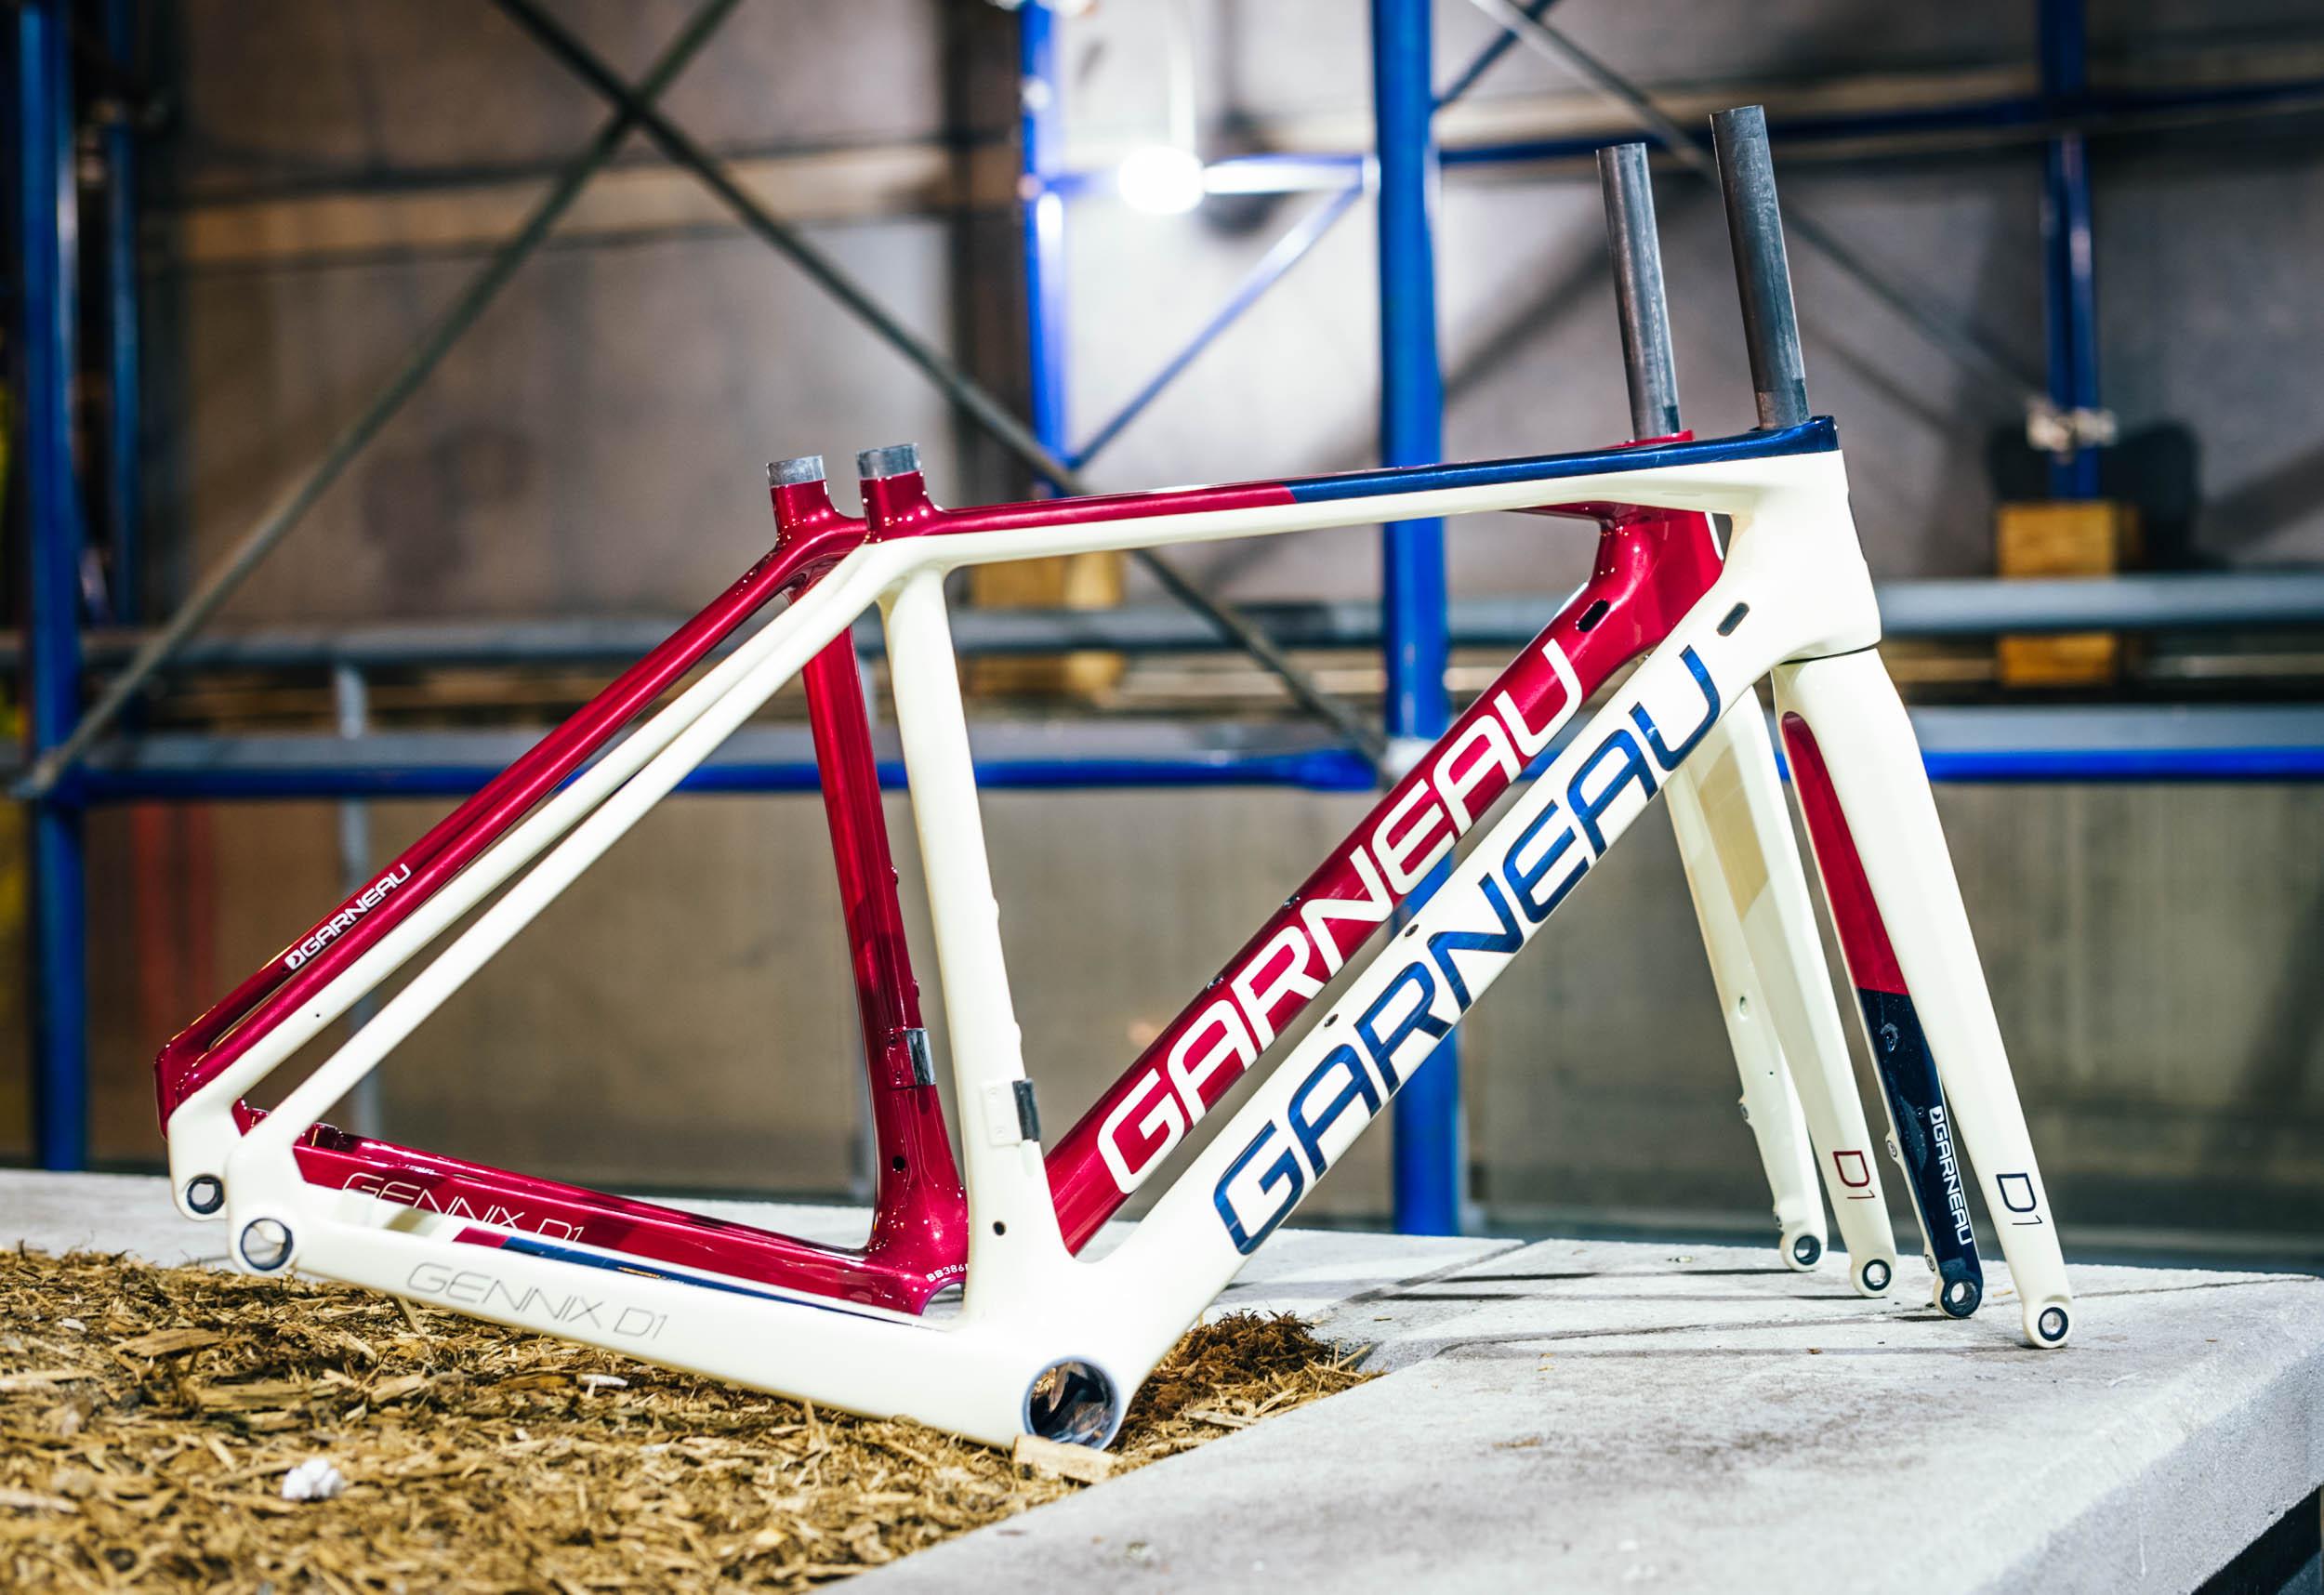 to-be-determined-photo-rhetoric-garneau-team-bikes-100.jpg